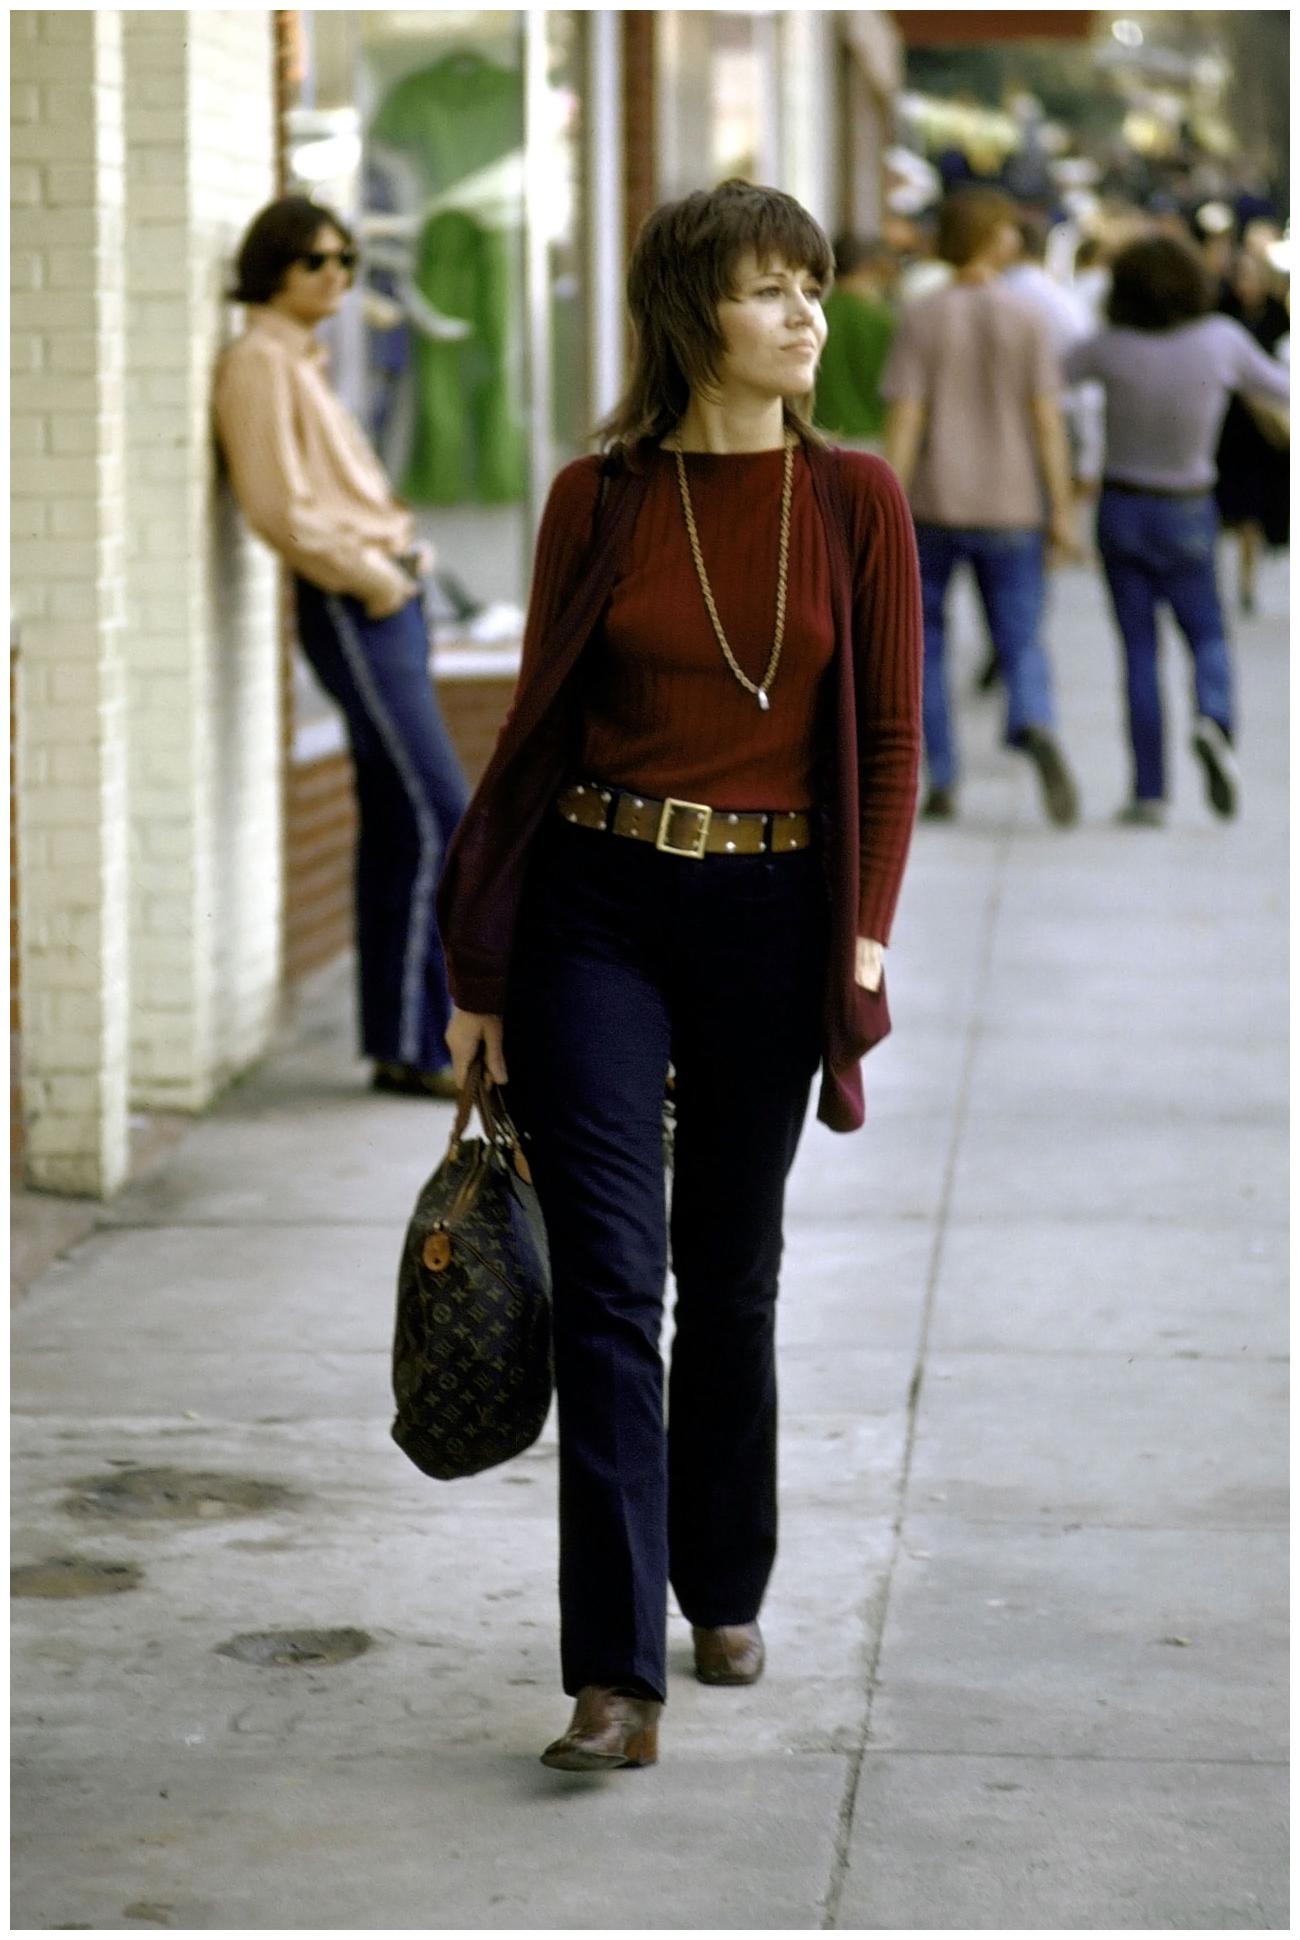 Jane Fonda 169 Pleasurephoto